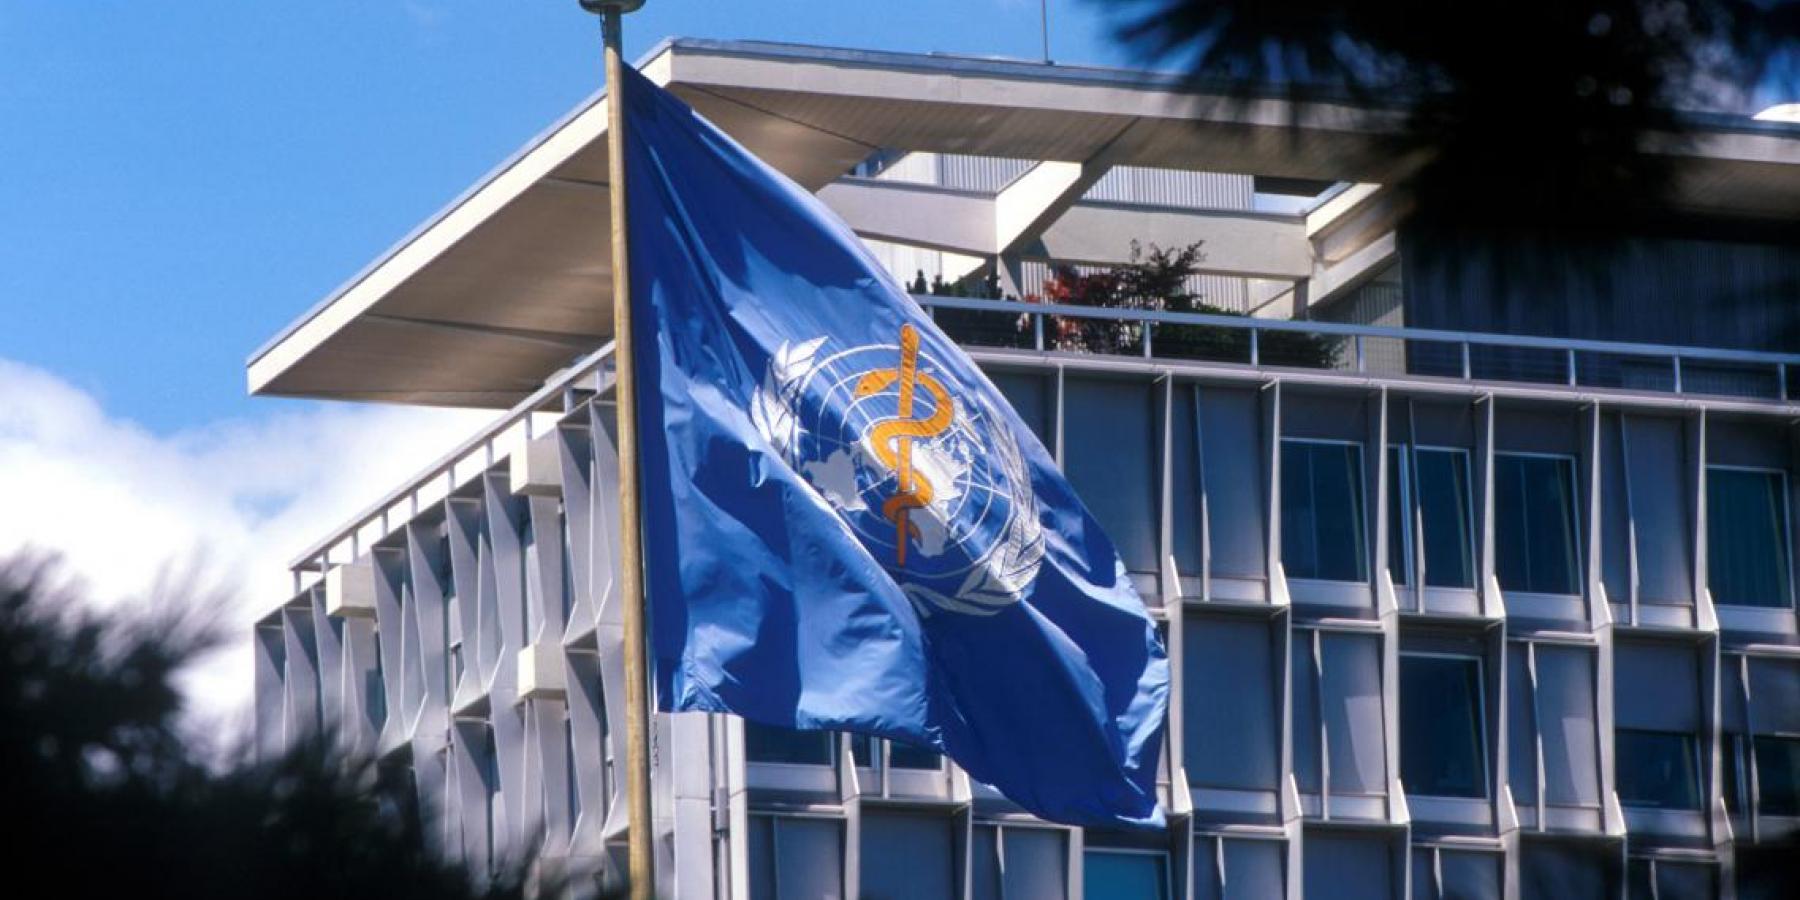 WHO Headquarters Geneva | © WHO: P. Virot